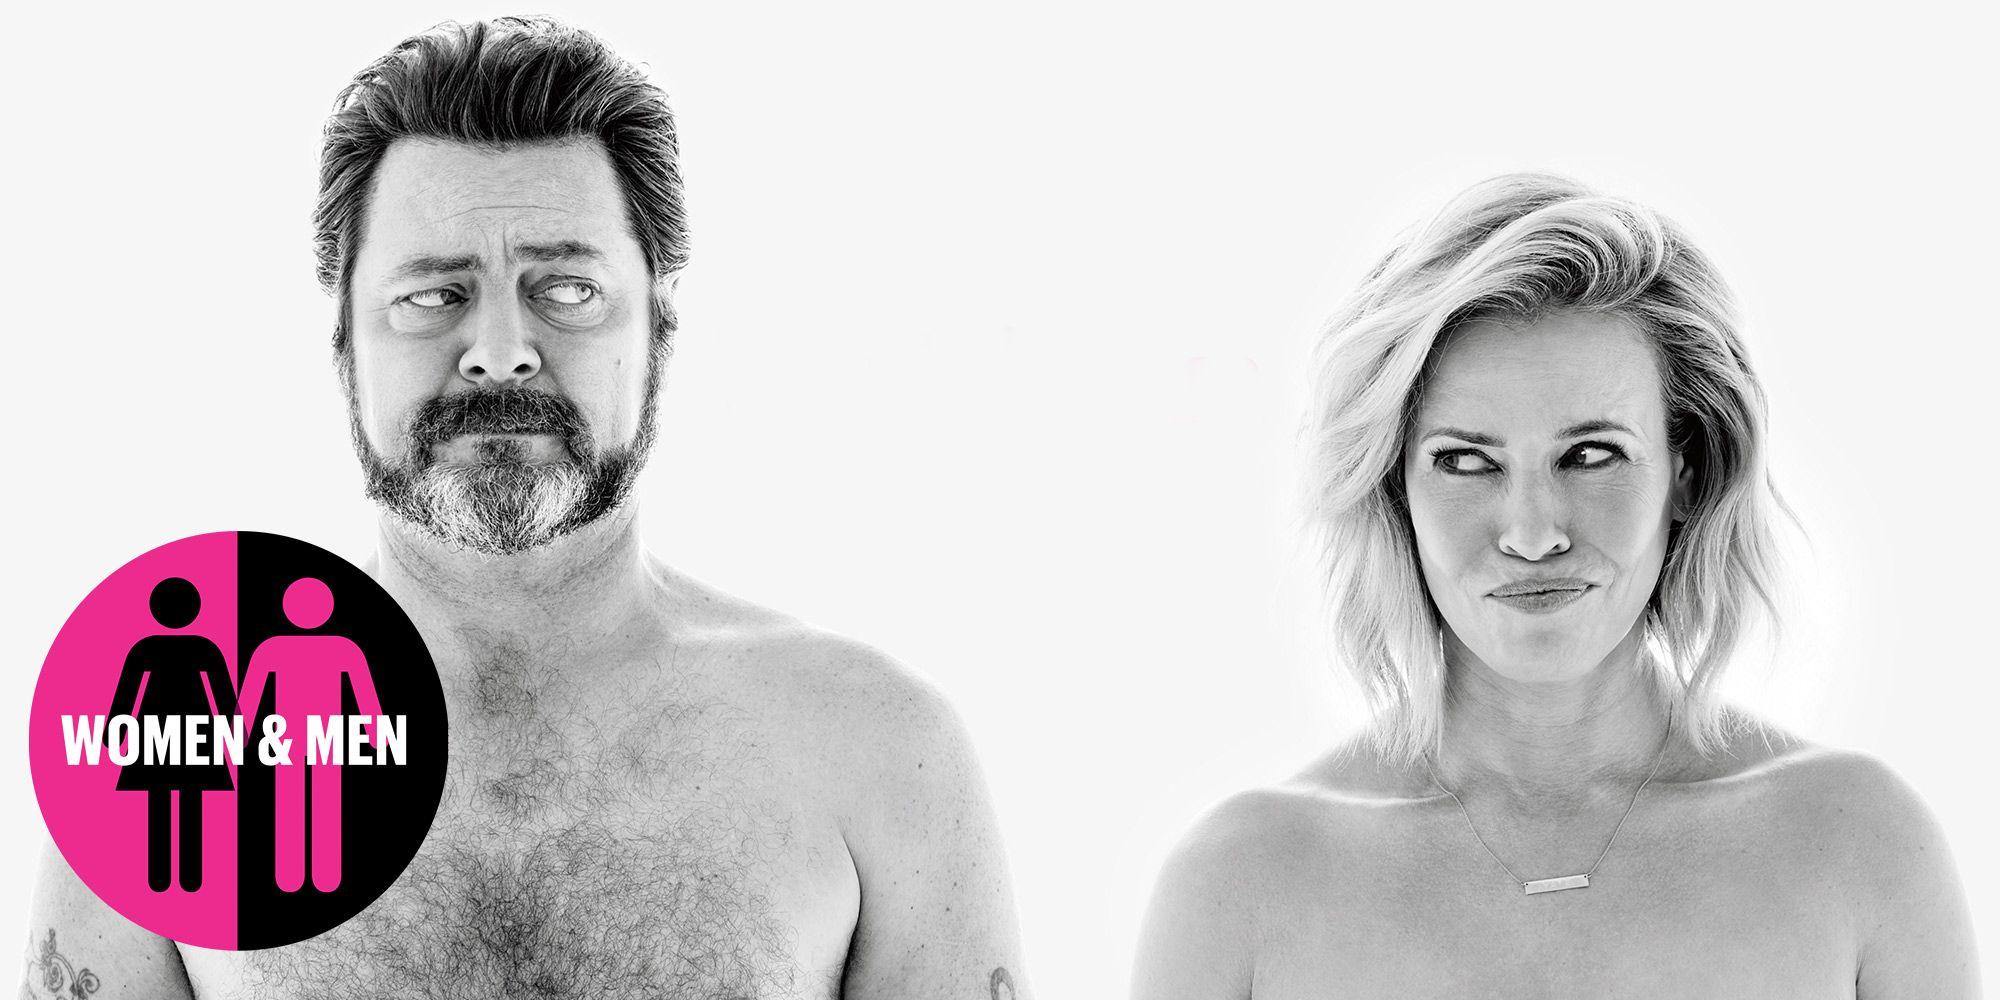 Nick Offerman and Chelsea Handler on Men, Women, and Genitalia